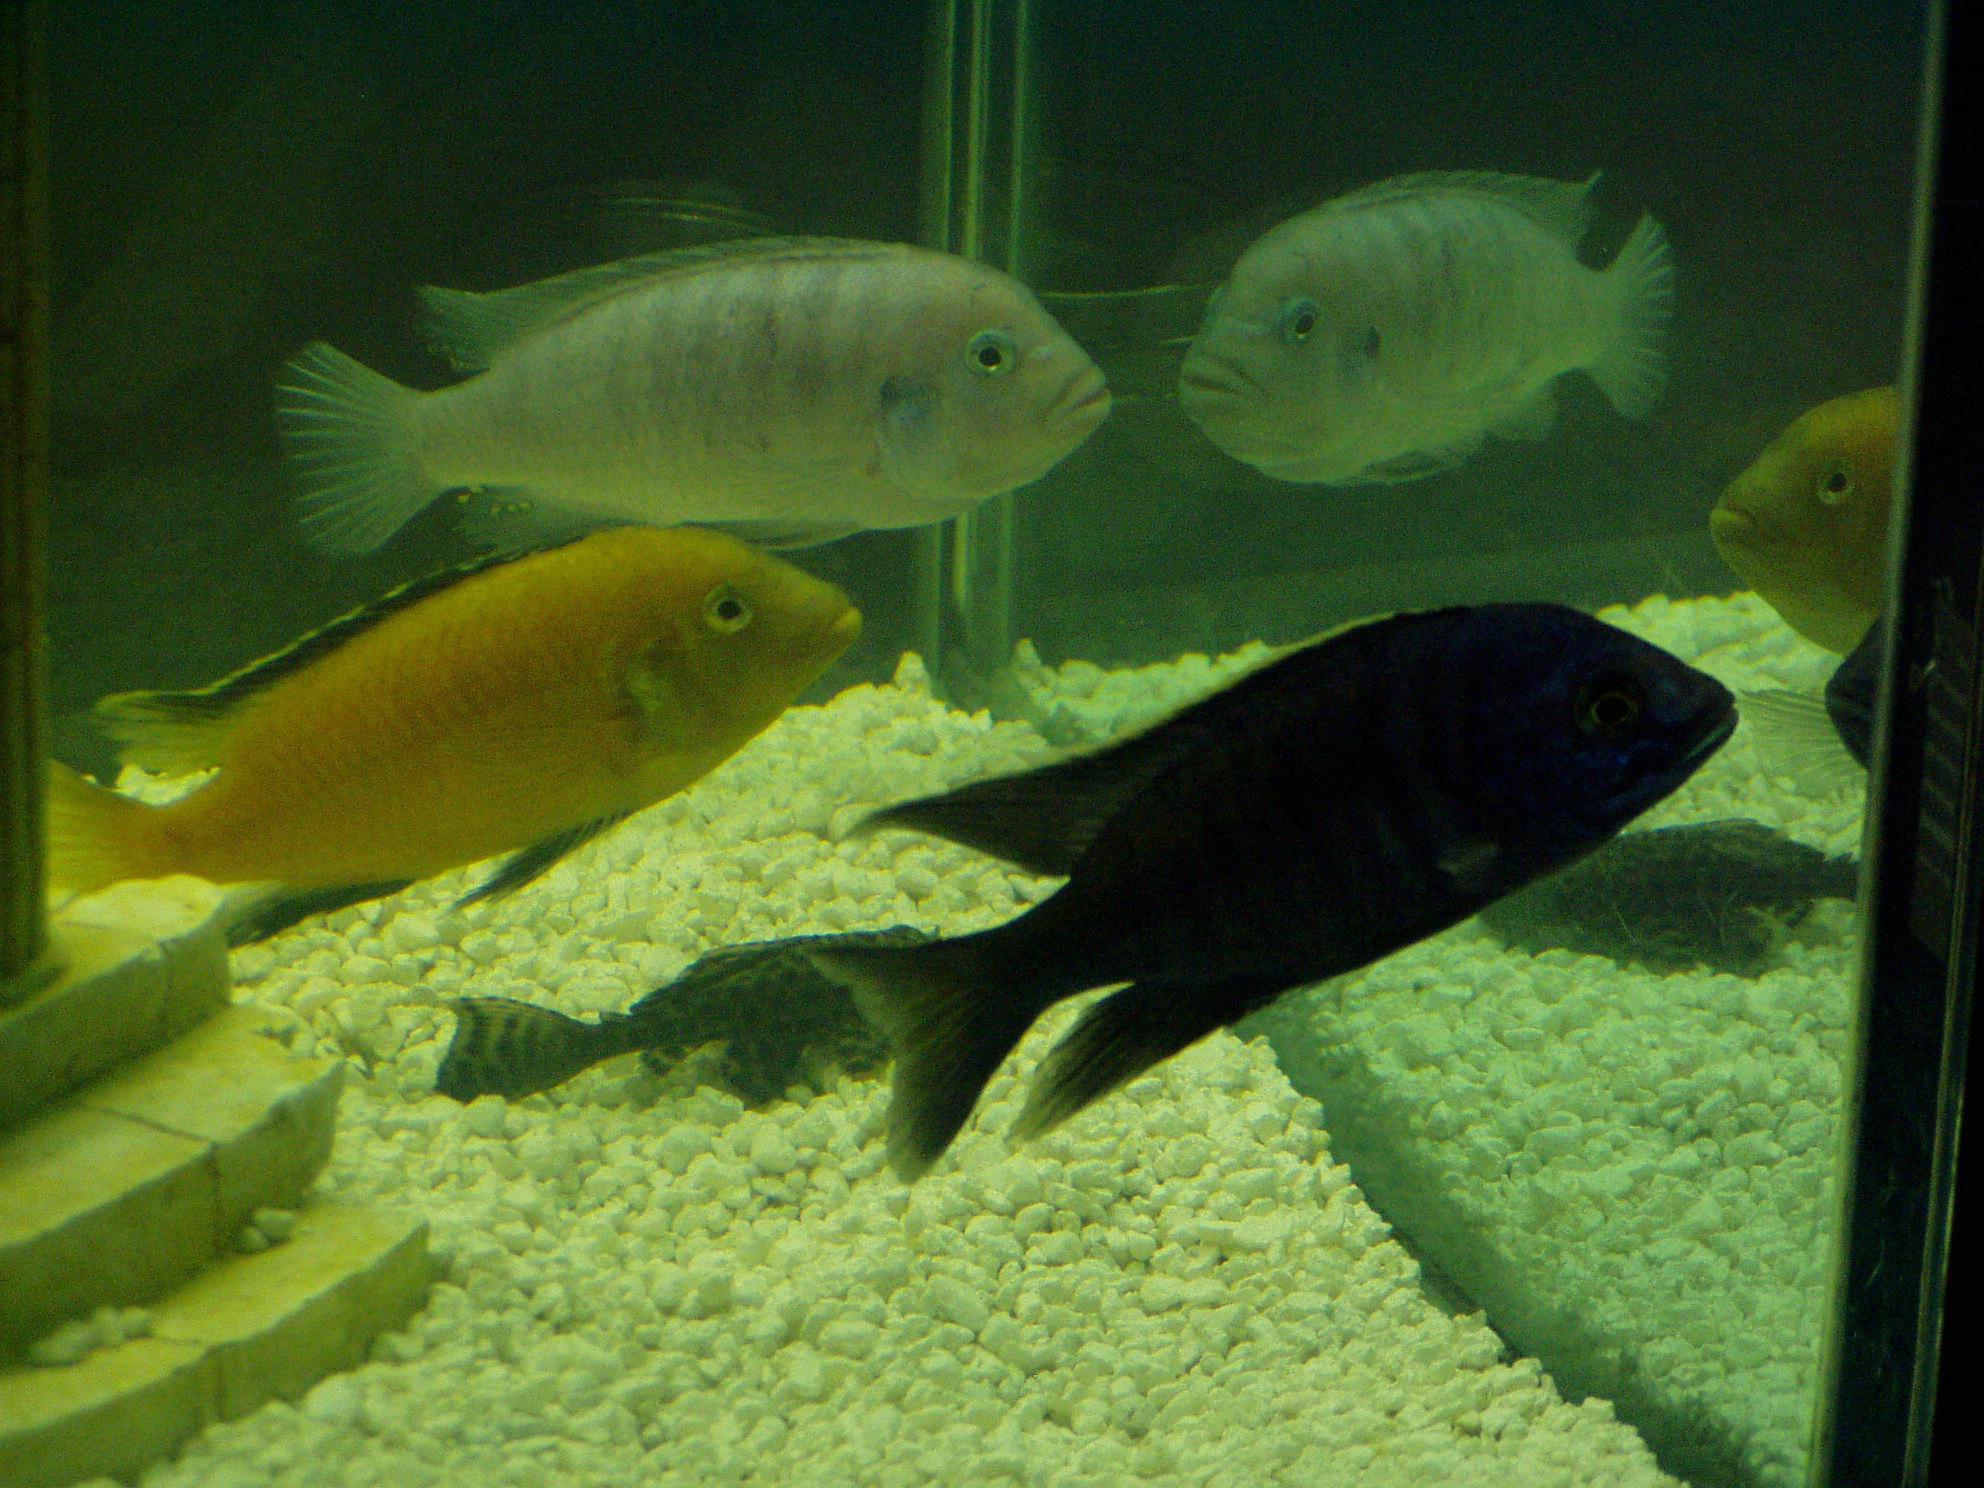 African cichlid fish tank car interior design for African cichlid fish